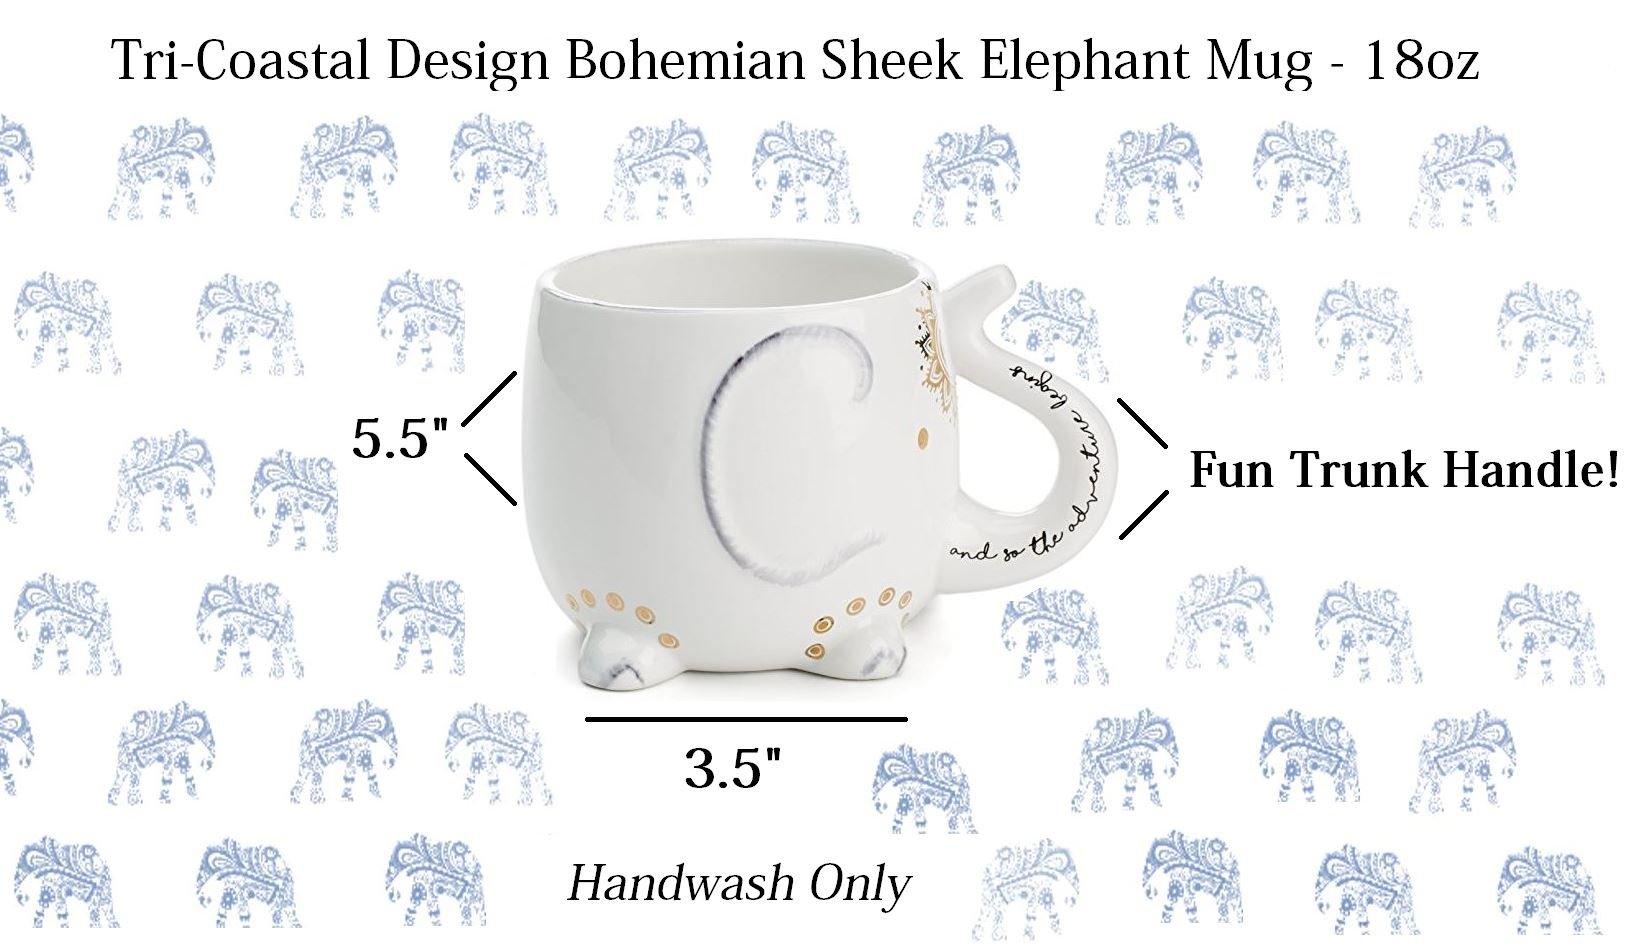 White Ceramic Coffee or Tea Mugs: Tri-Coastal Design Soho Boho Elephant Coffee Mug with Gold Foil Details, Fun Trunk Handle and Printed Saying - 18.6 Fluid Ounce Large, Cute Handmade Cup by Tri-coastal Design (Image #3)